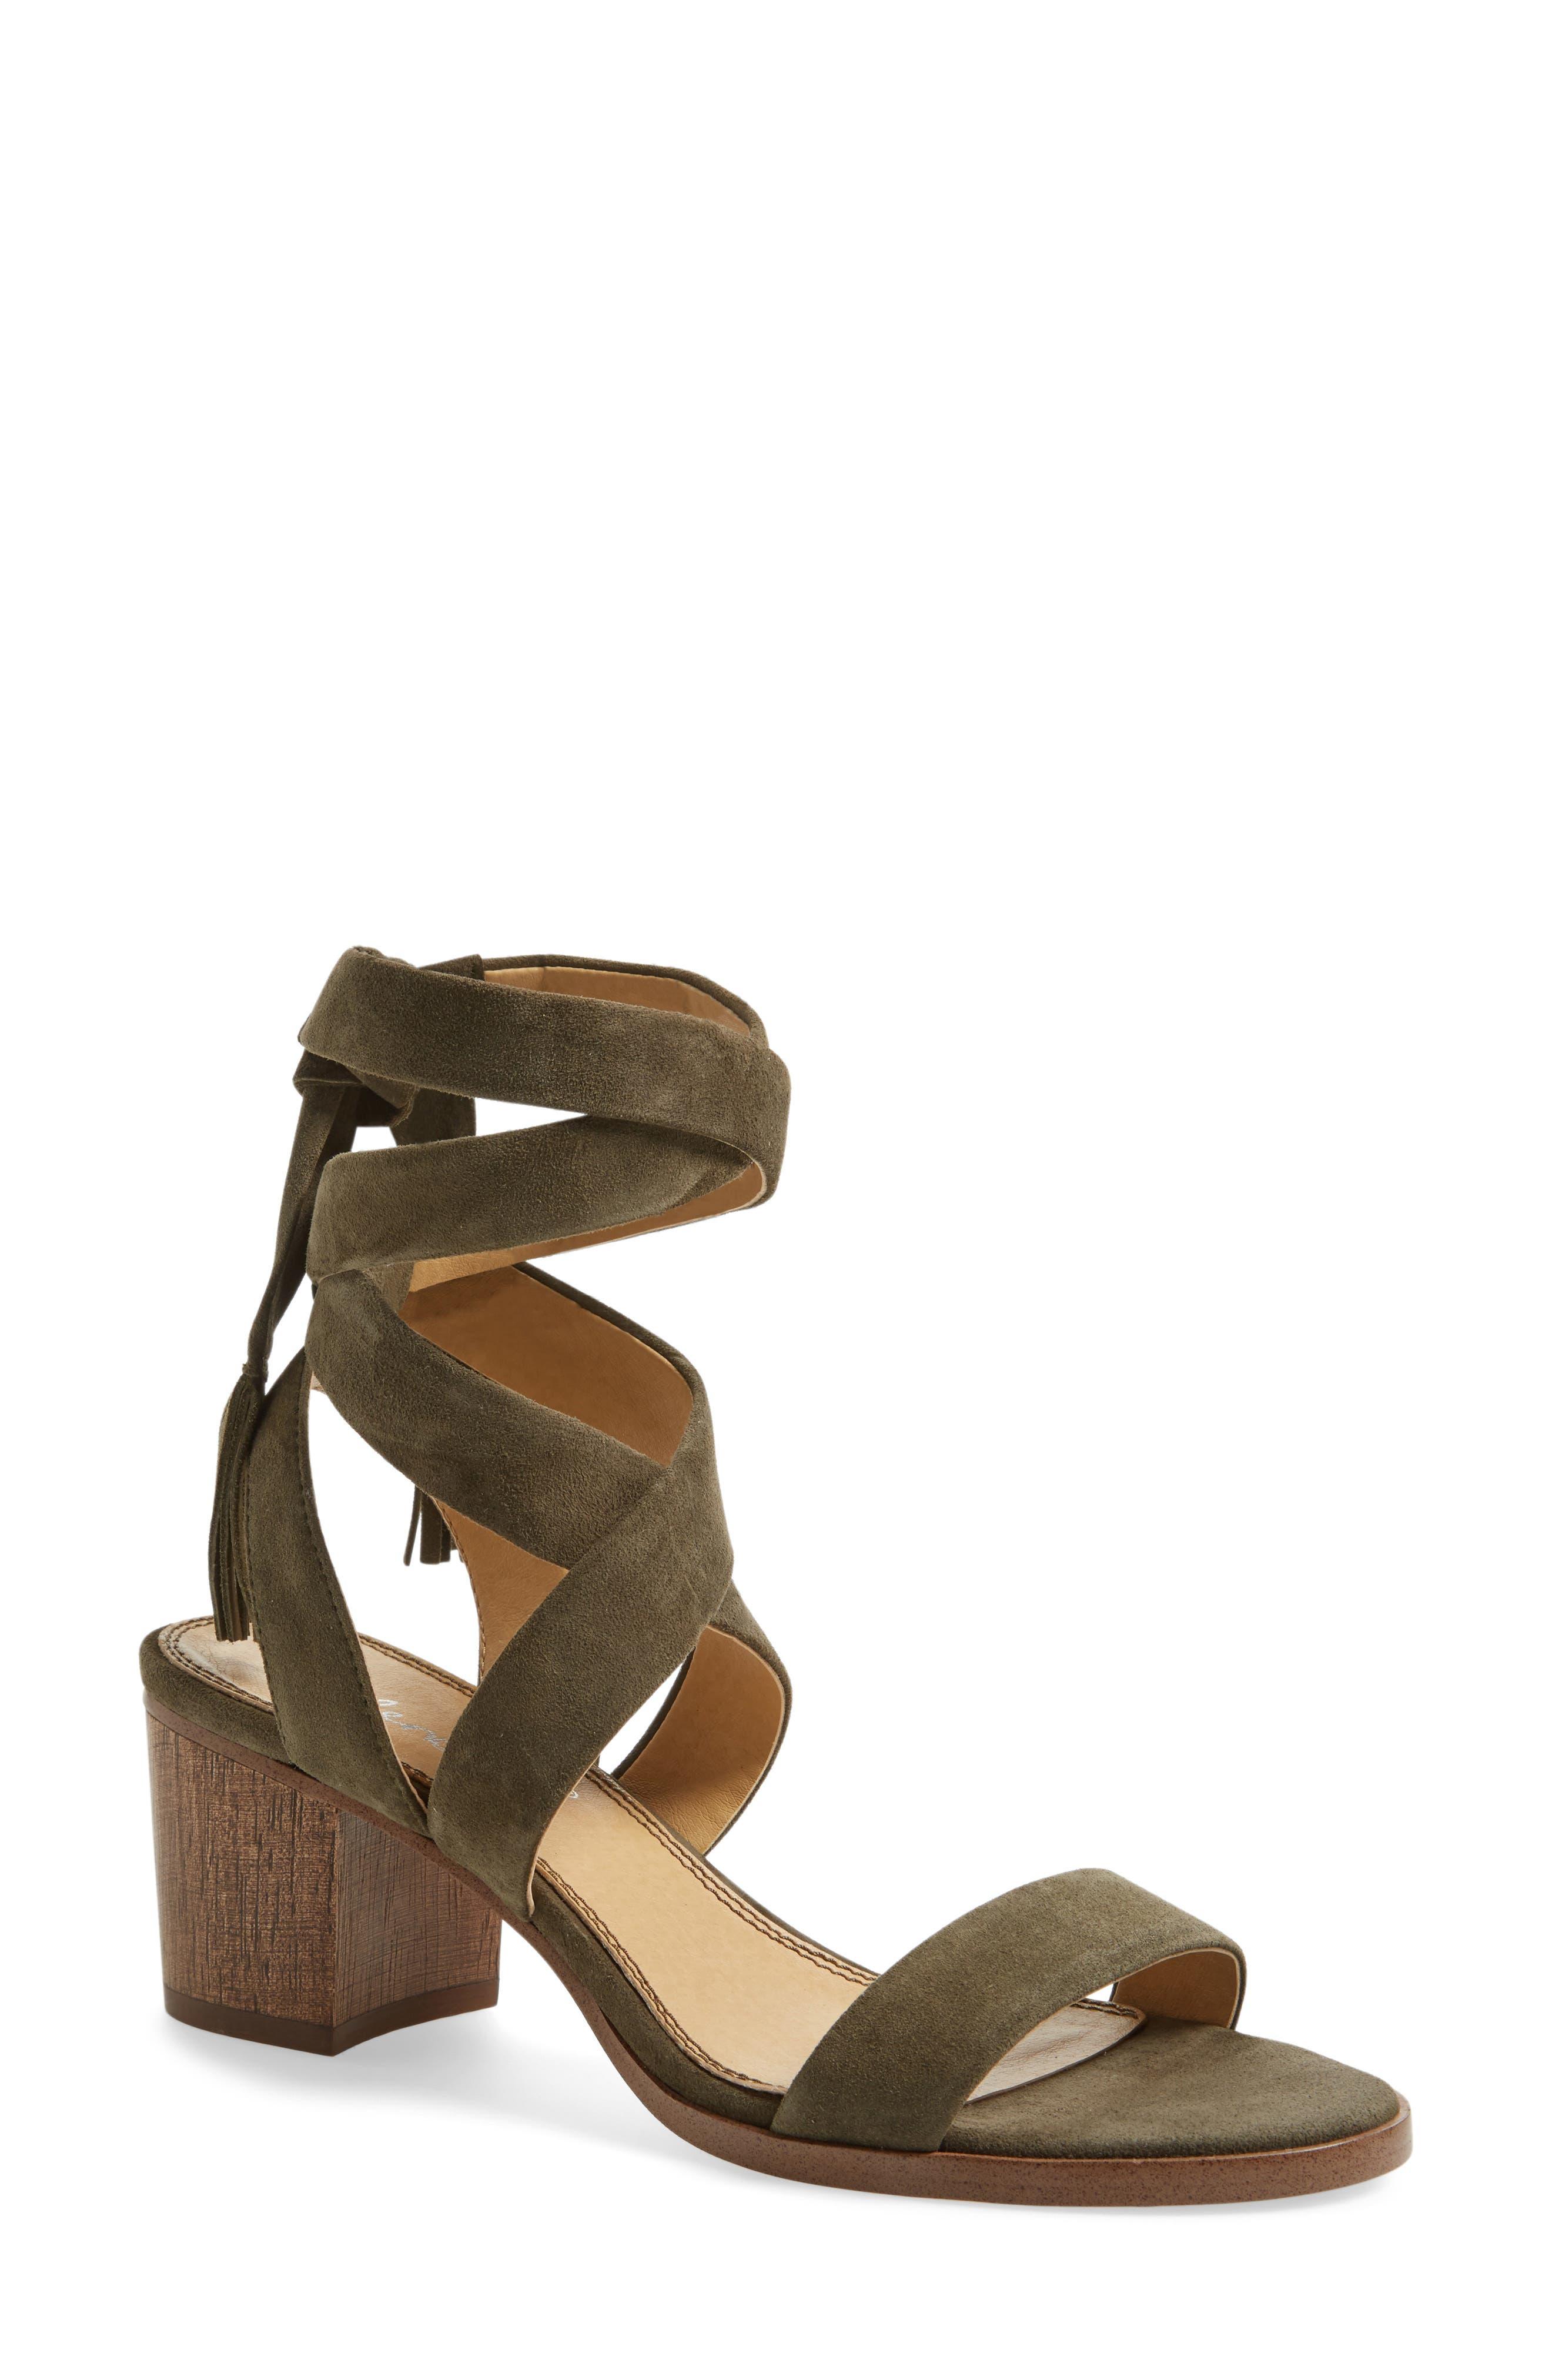 Alternate Image 1 Selected - Splendid Janet Block Heel Sandal (Women)